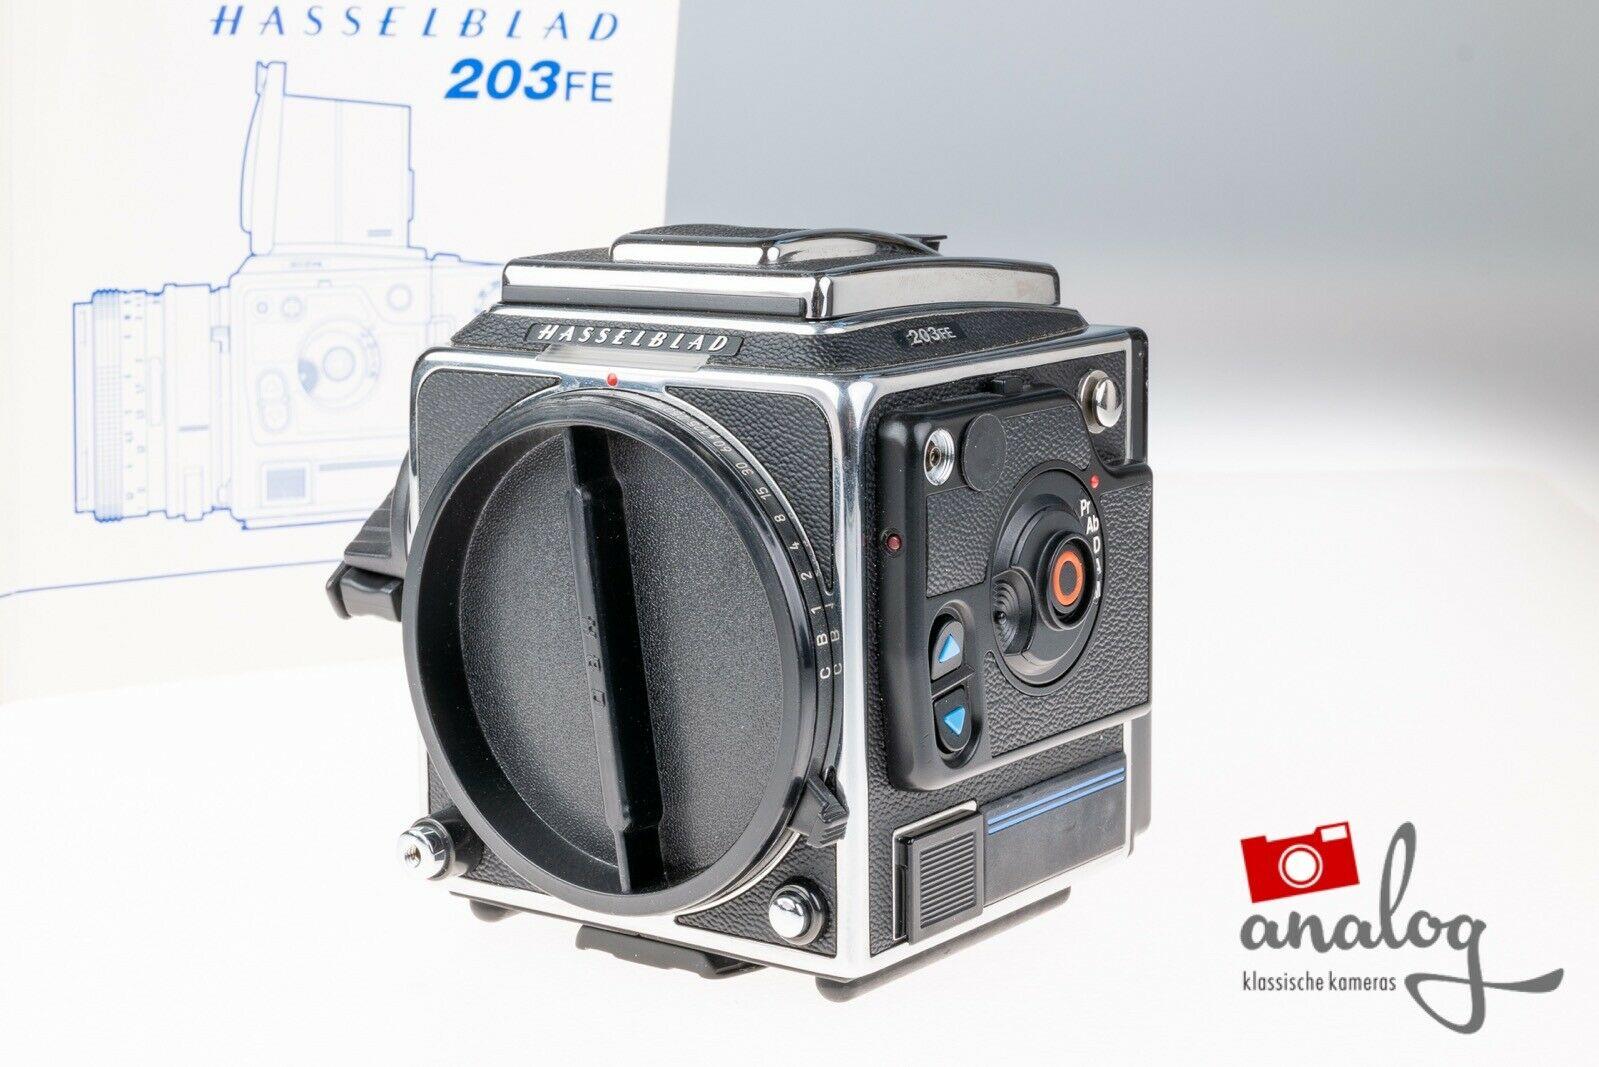 Hasselblad 203FE chrome